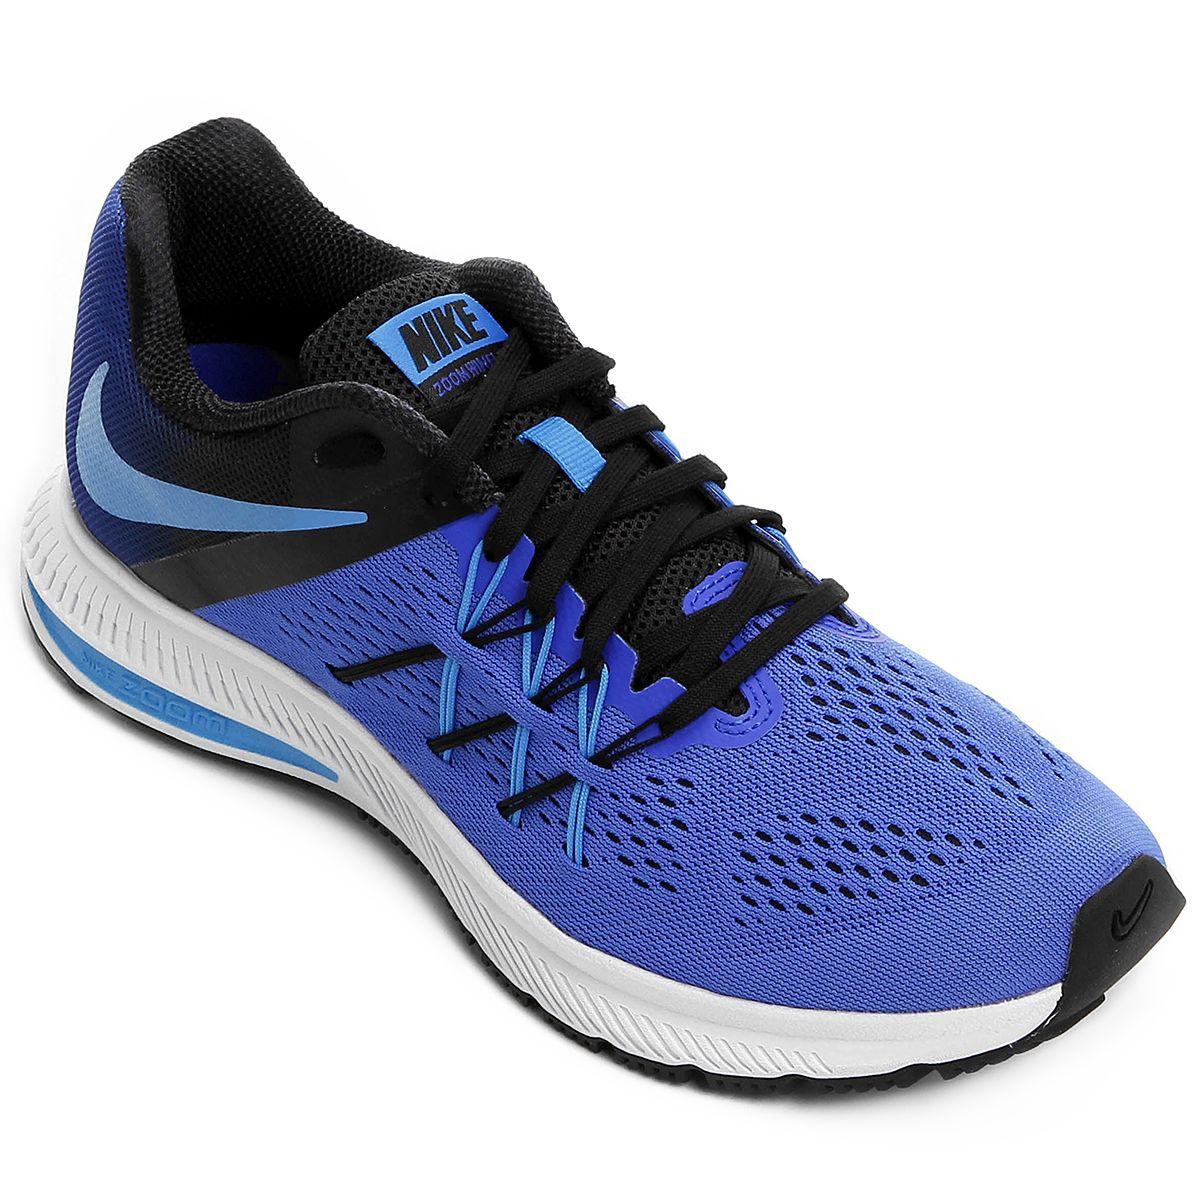 a29ced81c5 Tênis Nike Zoom Winflo 3 Azul e Preto